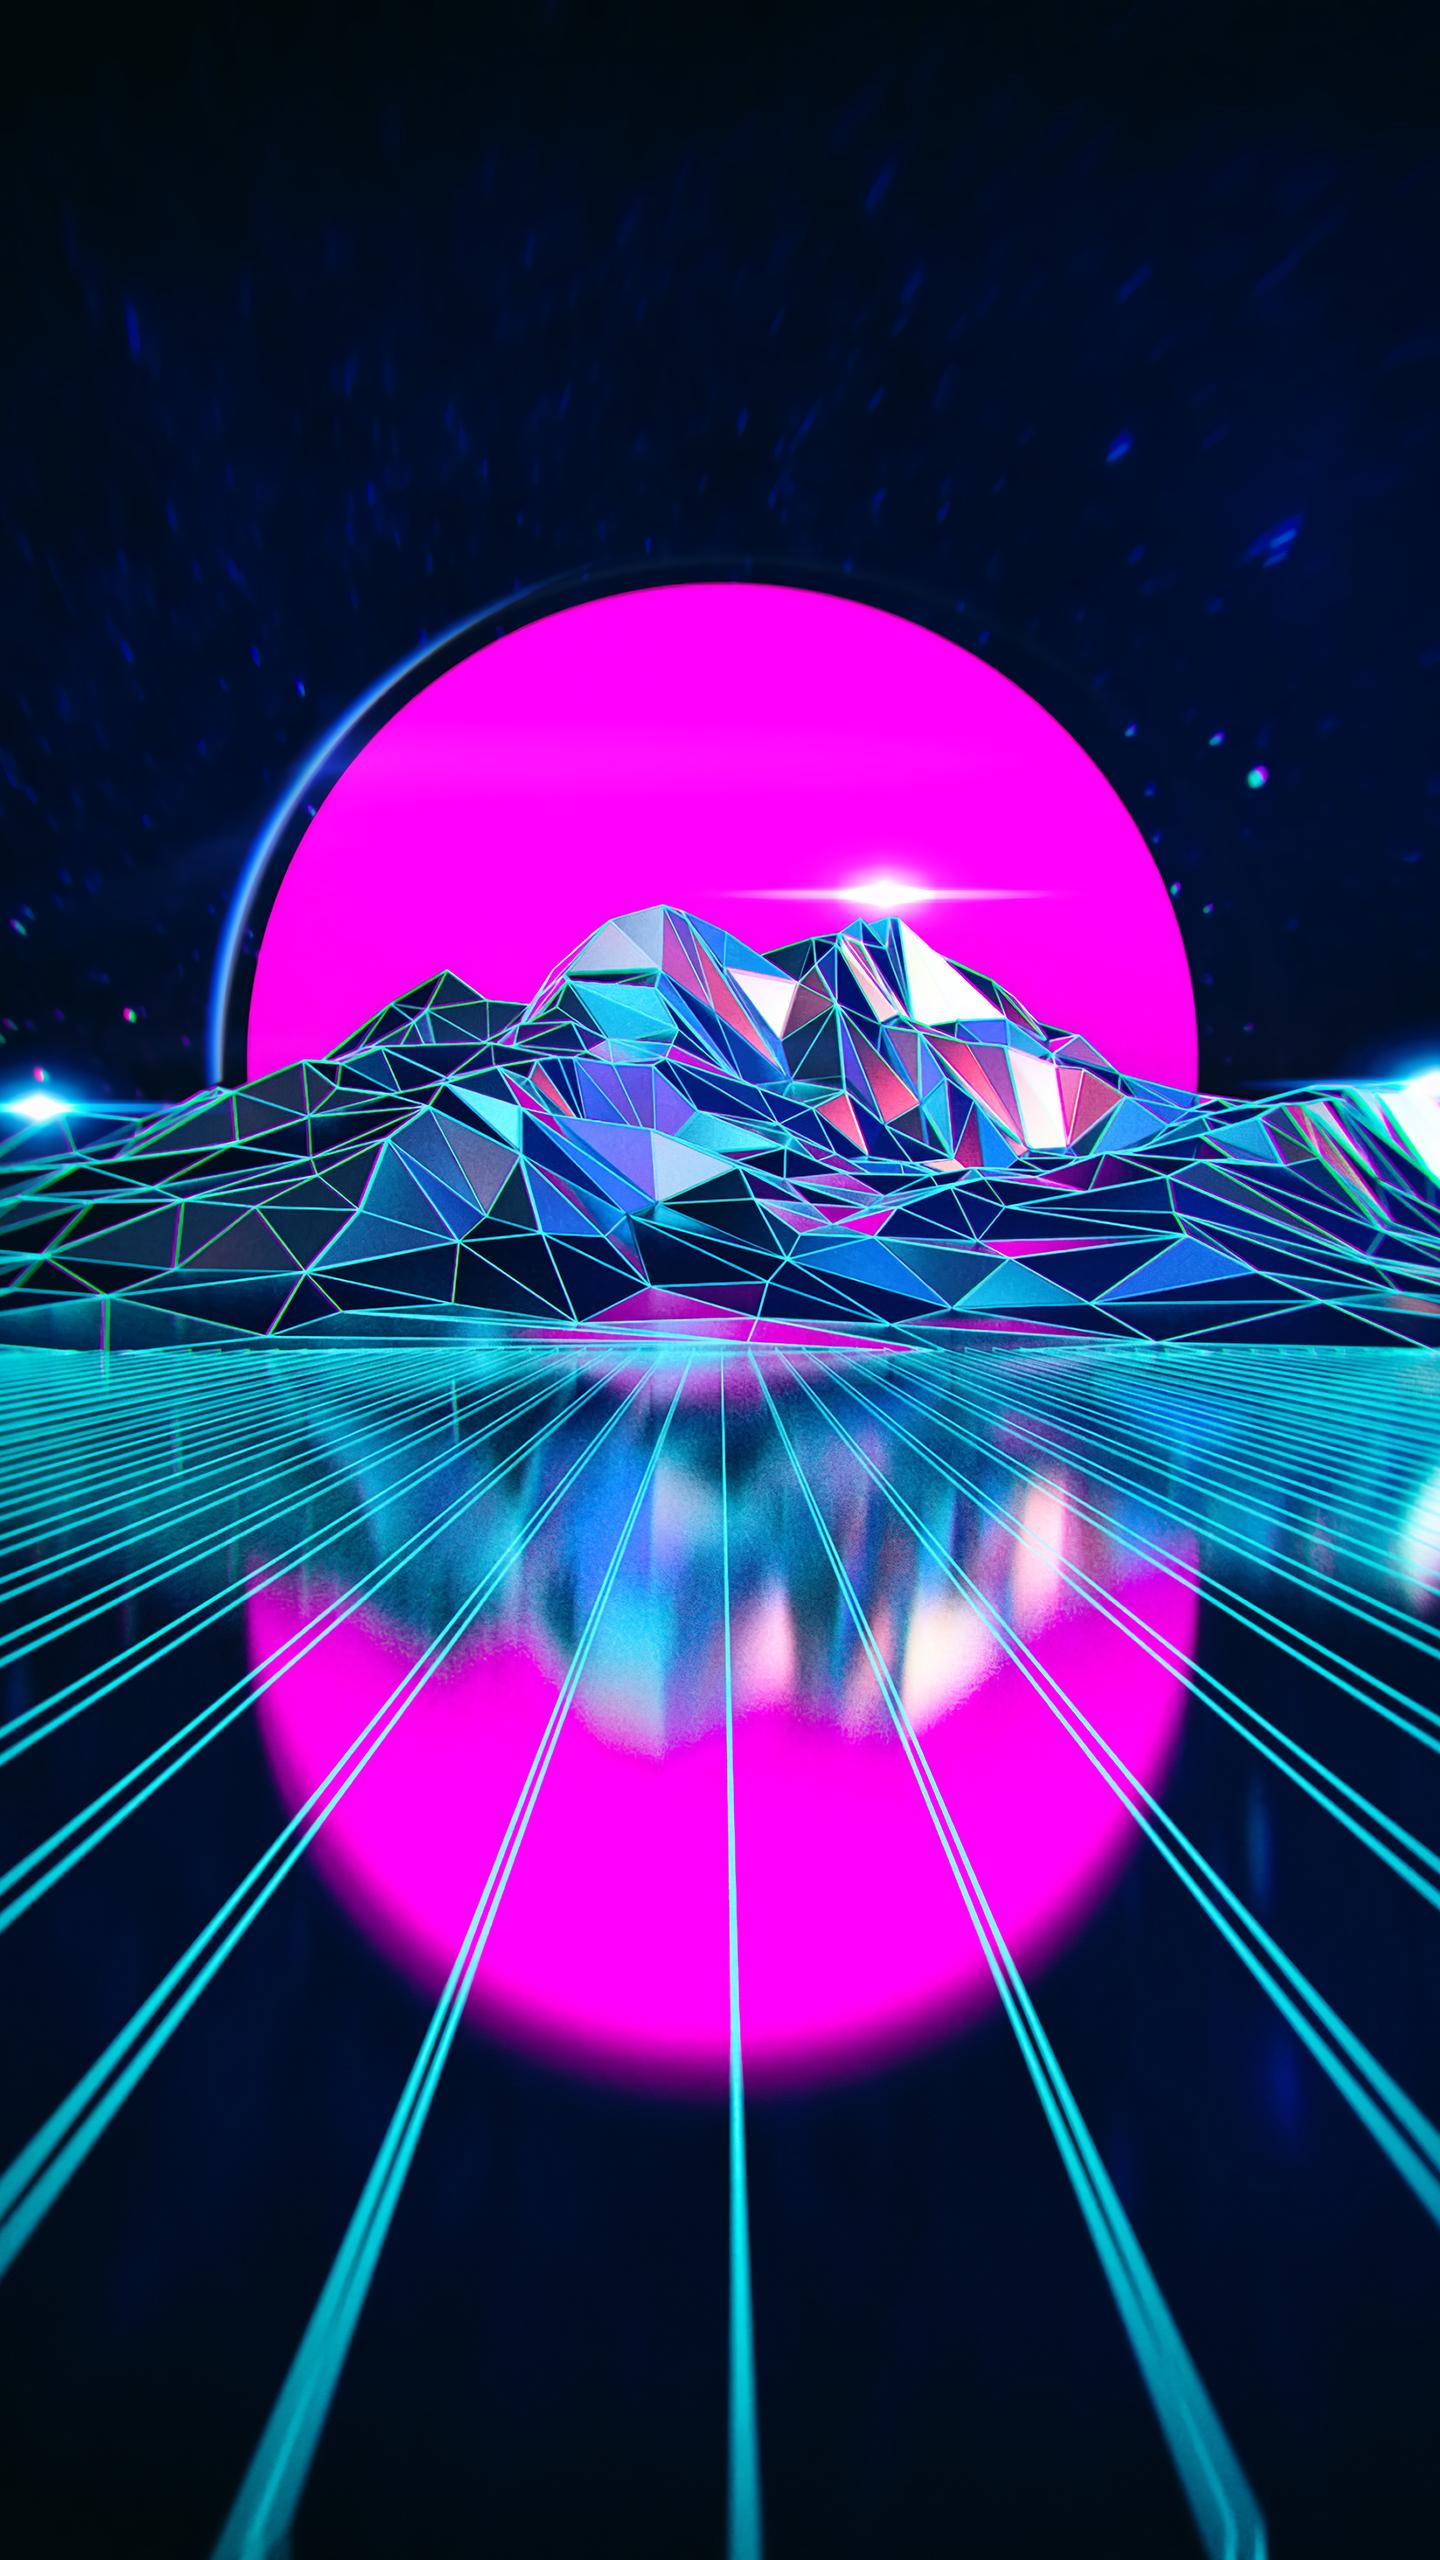 Vaporwave Sfondi Vaporwave Vaporwave Wallpaper Glitch Wallpaper Neon Wallpaper